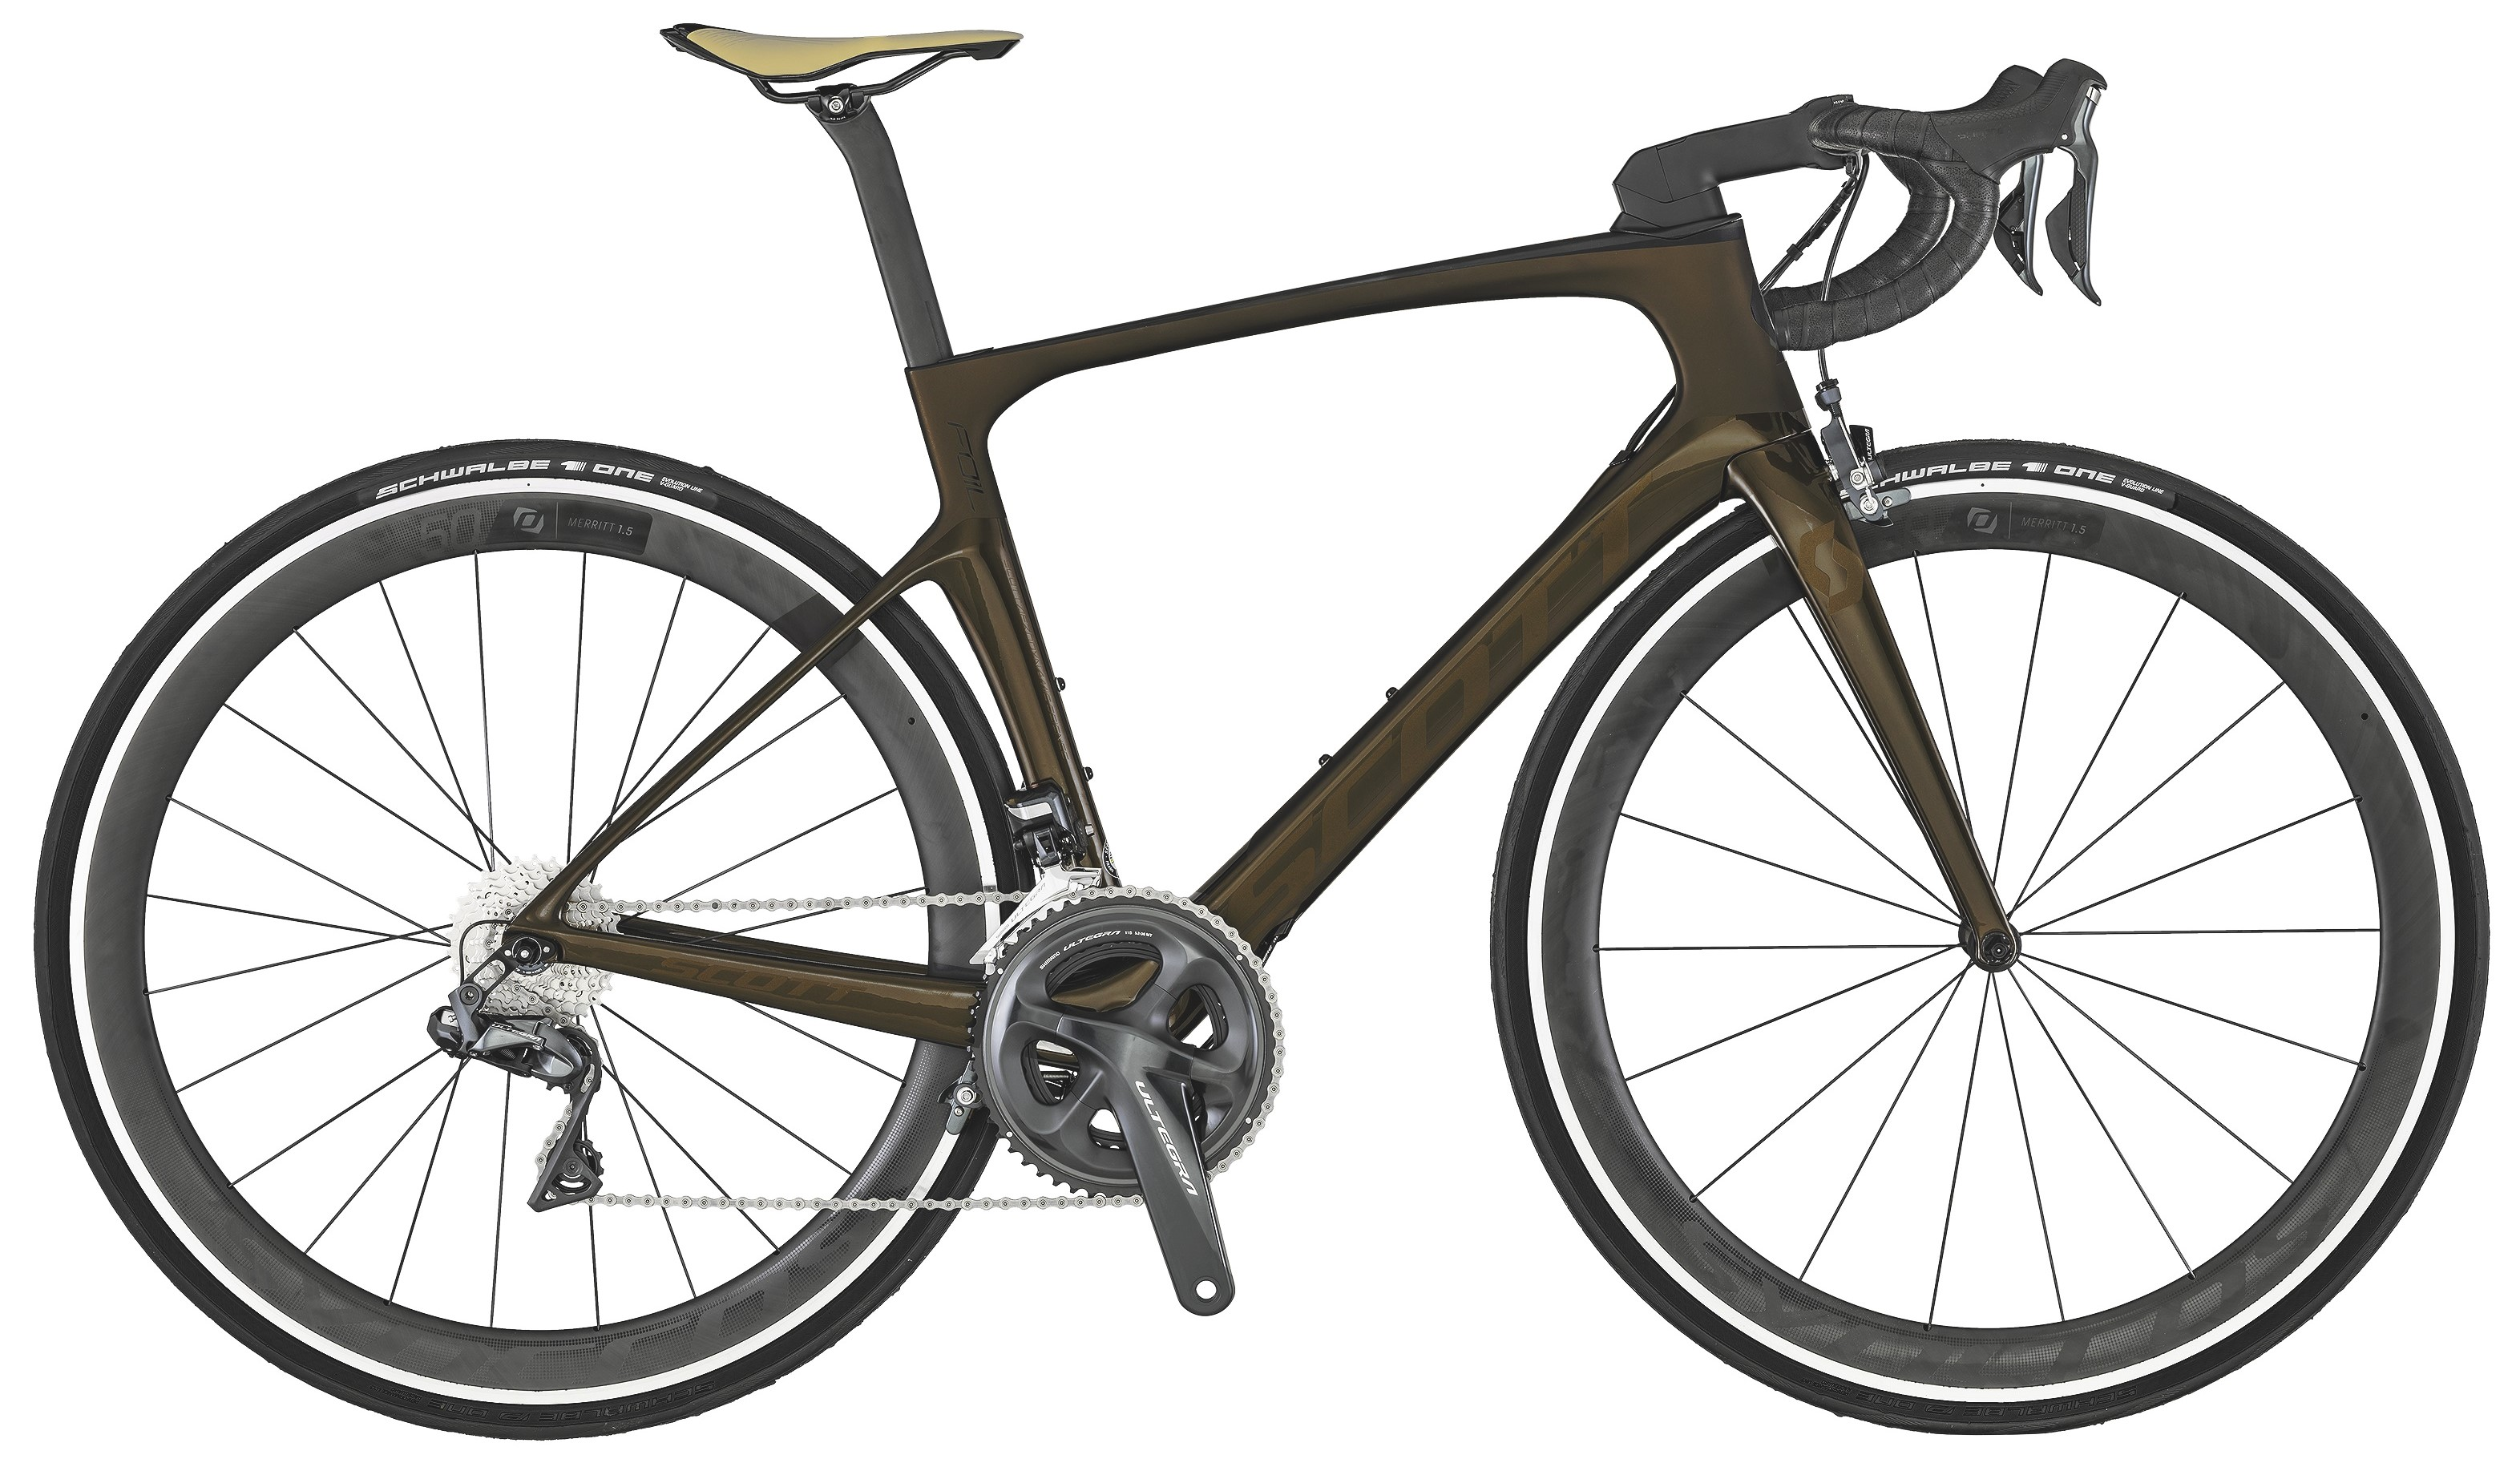 Scott Foil 10 Di2 Landeveissykkel Karbon, Ultegra R8050, 7,86 kg